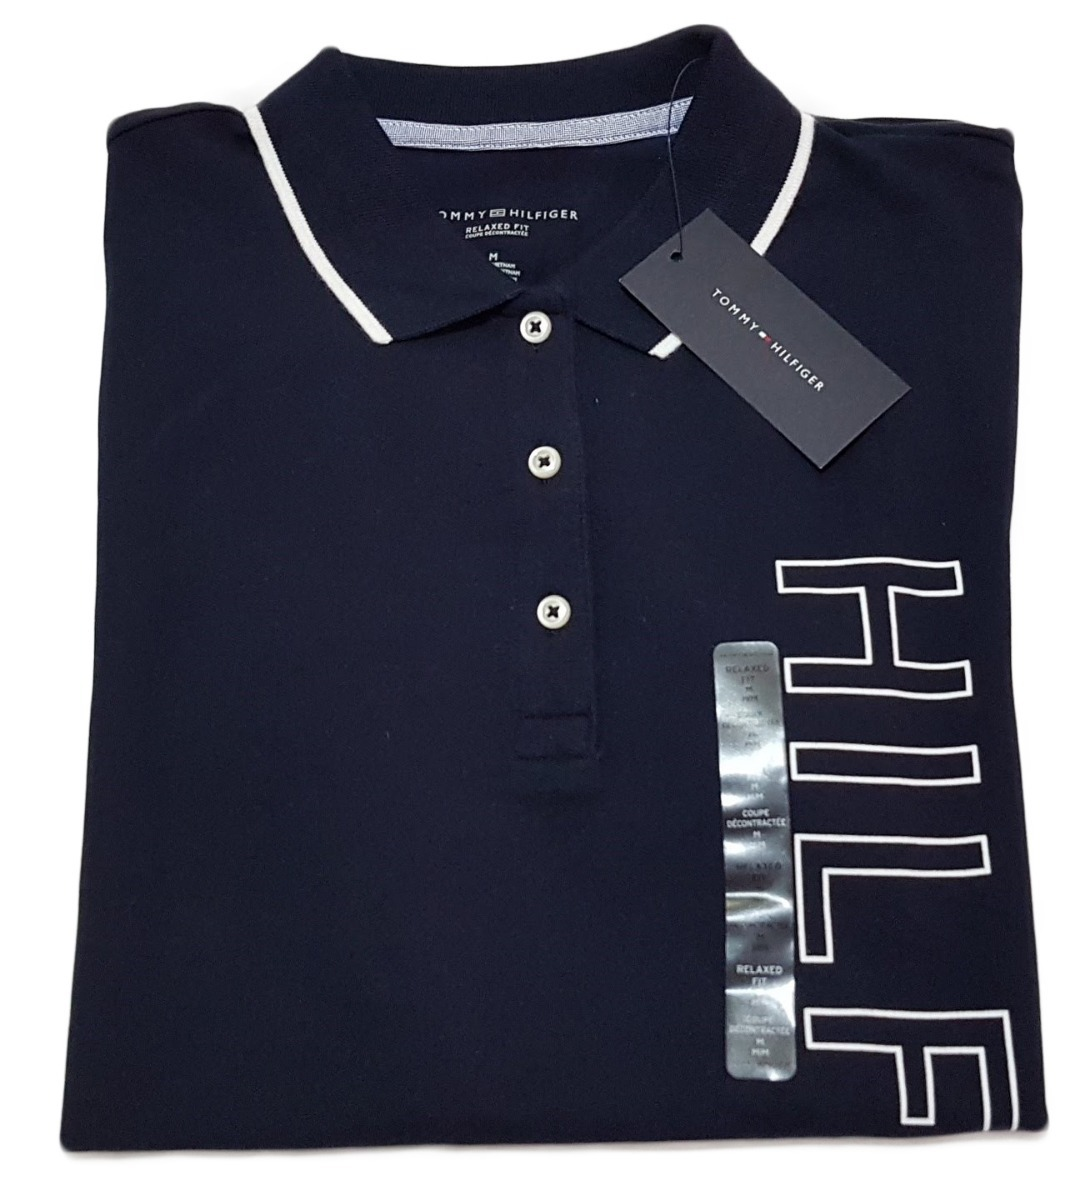 795ee93273755 camisa polo tommy hilfiger original feminina importada. Carregando zoom.